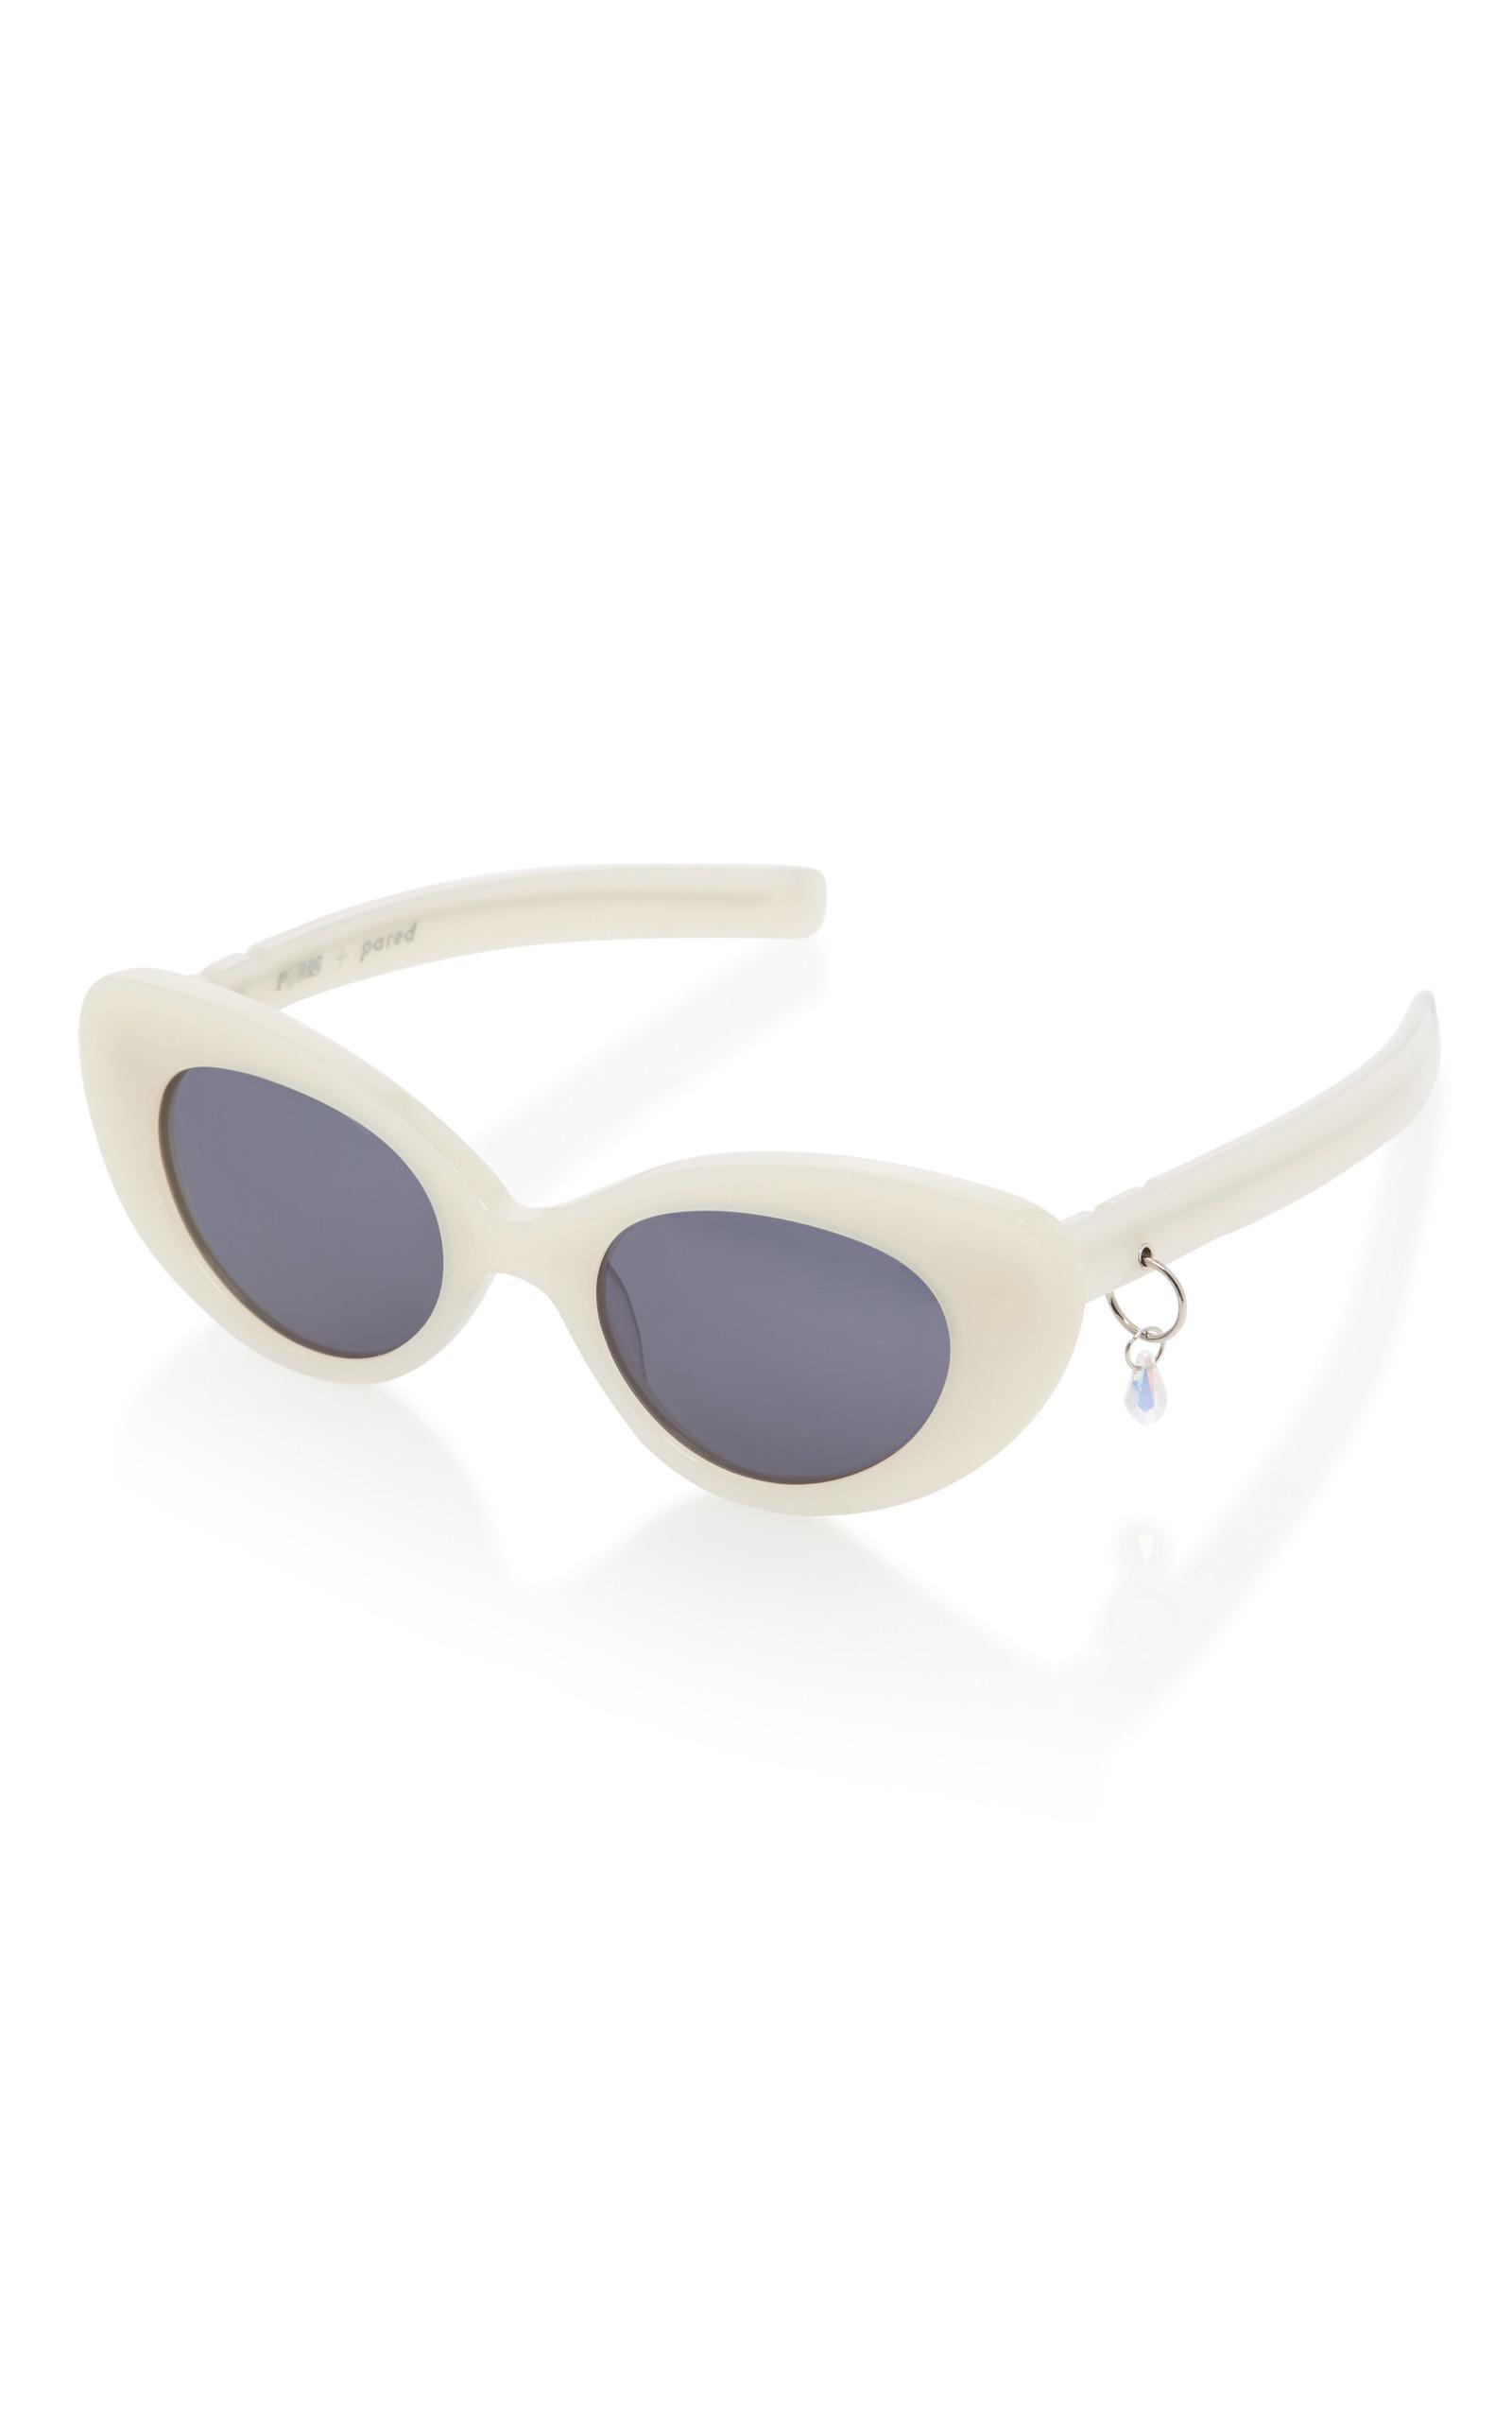 Acetate Cate-Eye Sunglasses Pared Eyewear BCThz